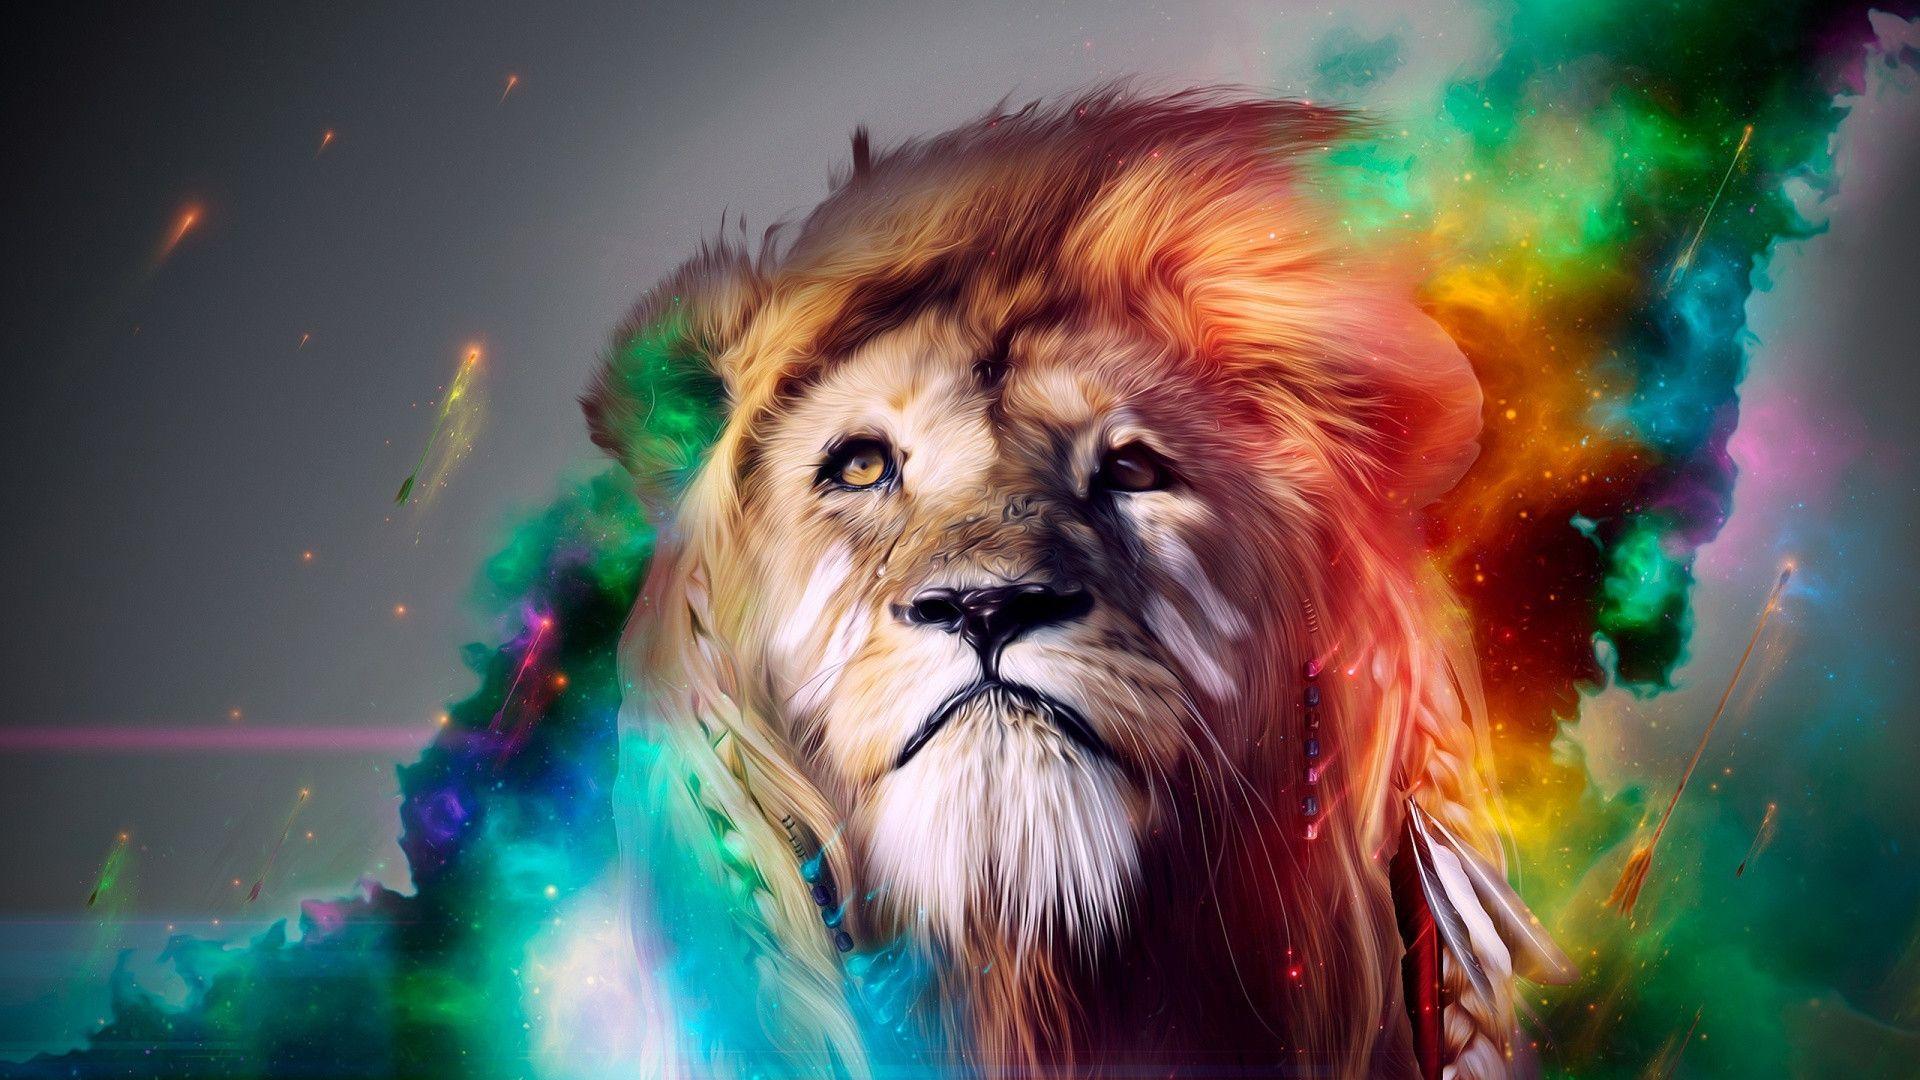 Hd 1920 X 1080 Rainbow Space Lion Aslanlar Aslan Sanat